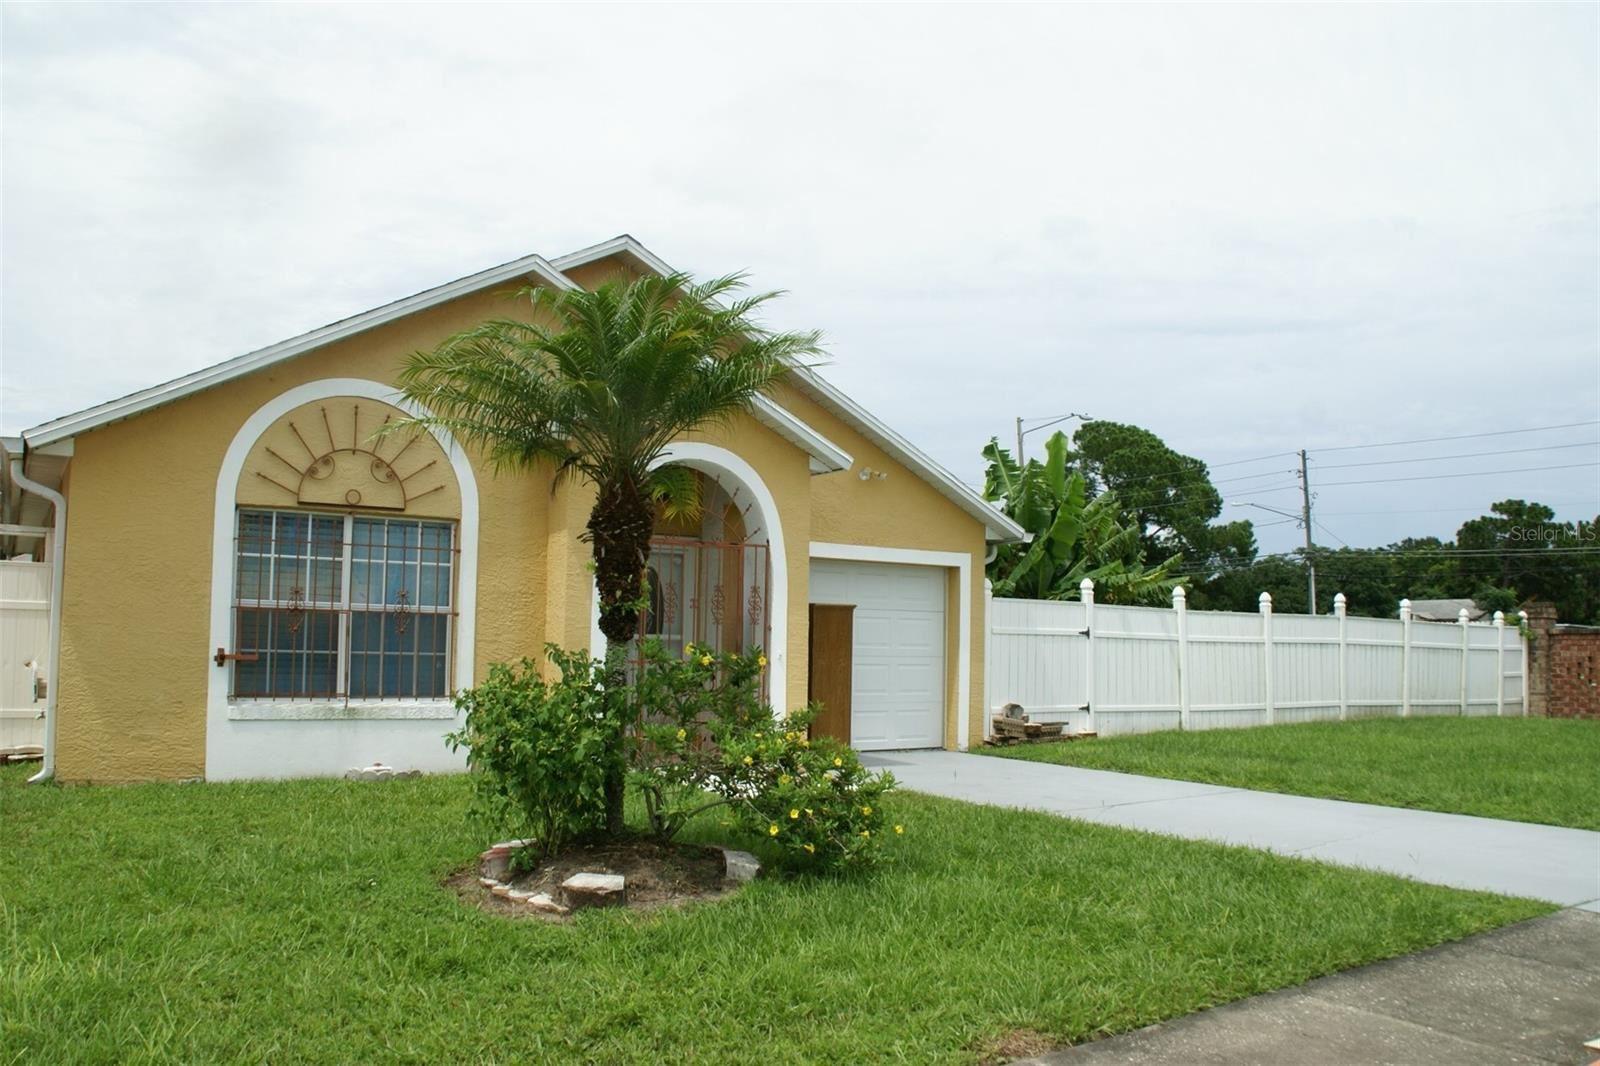 9955 DEAN ACRE DRIVE, Orlando, FL 32825 - MLS#: O5959998